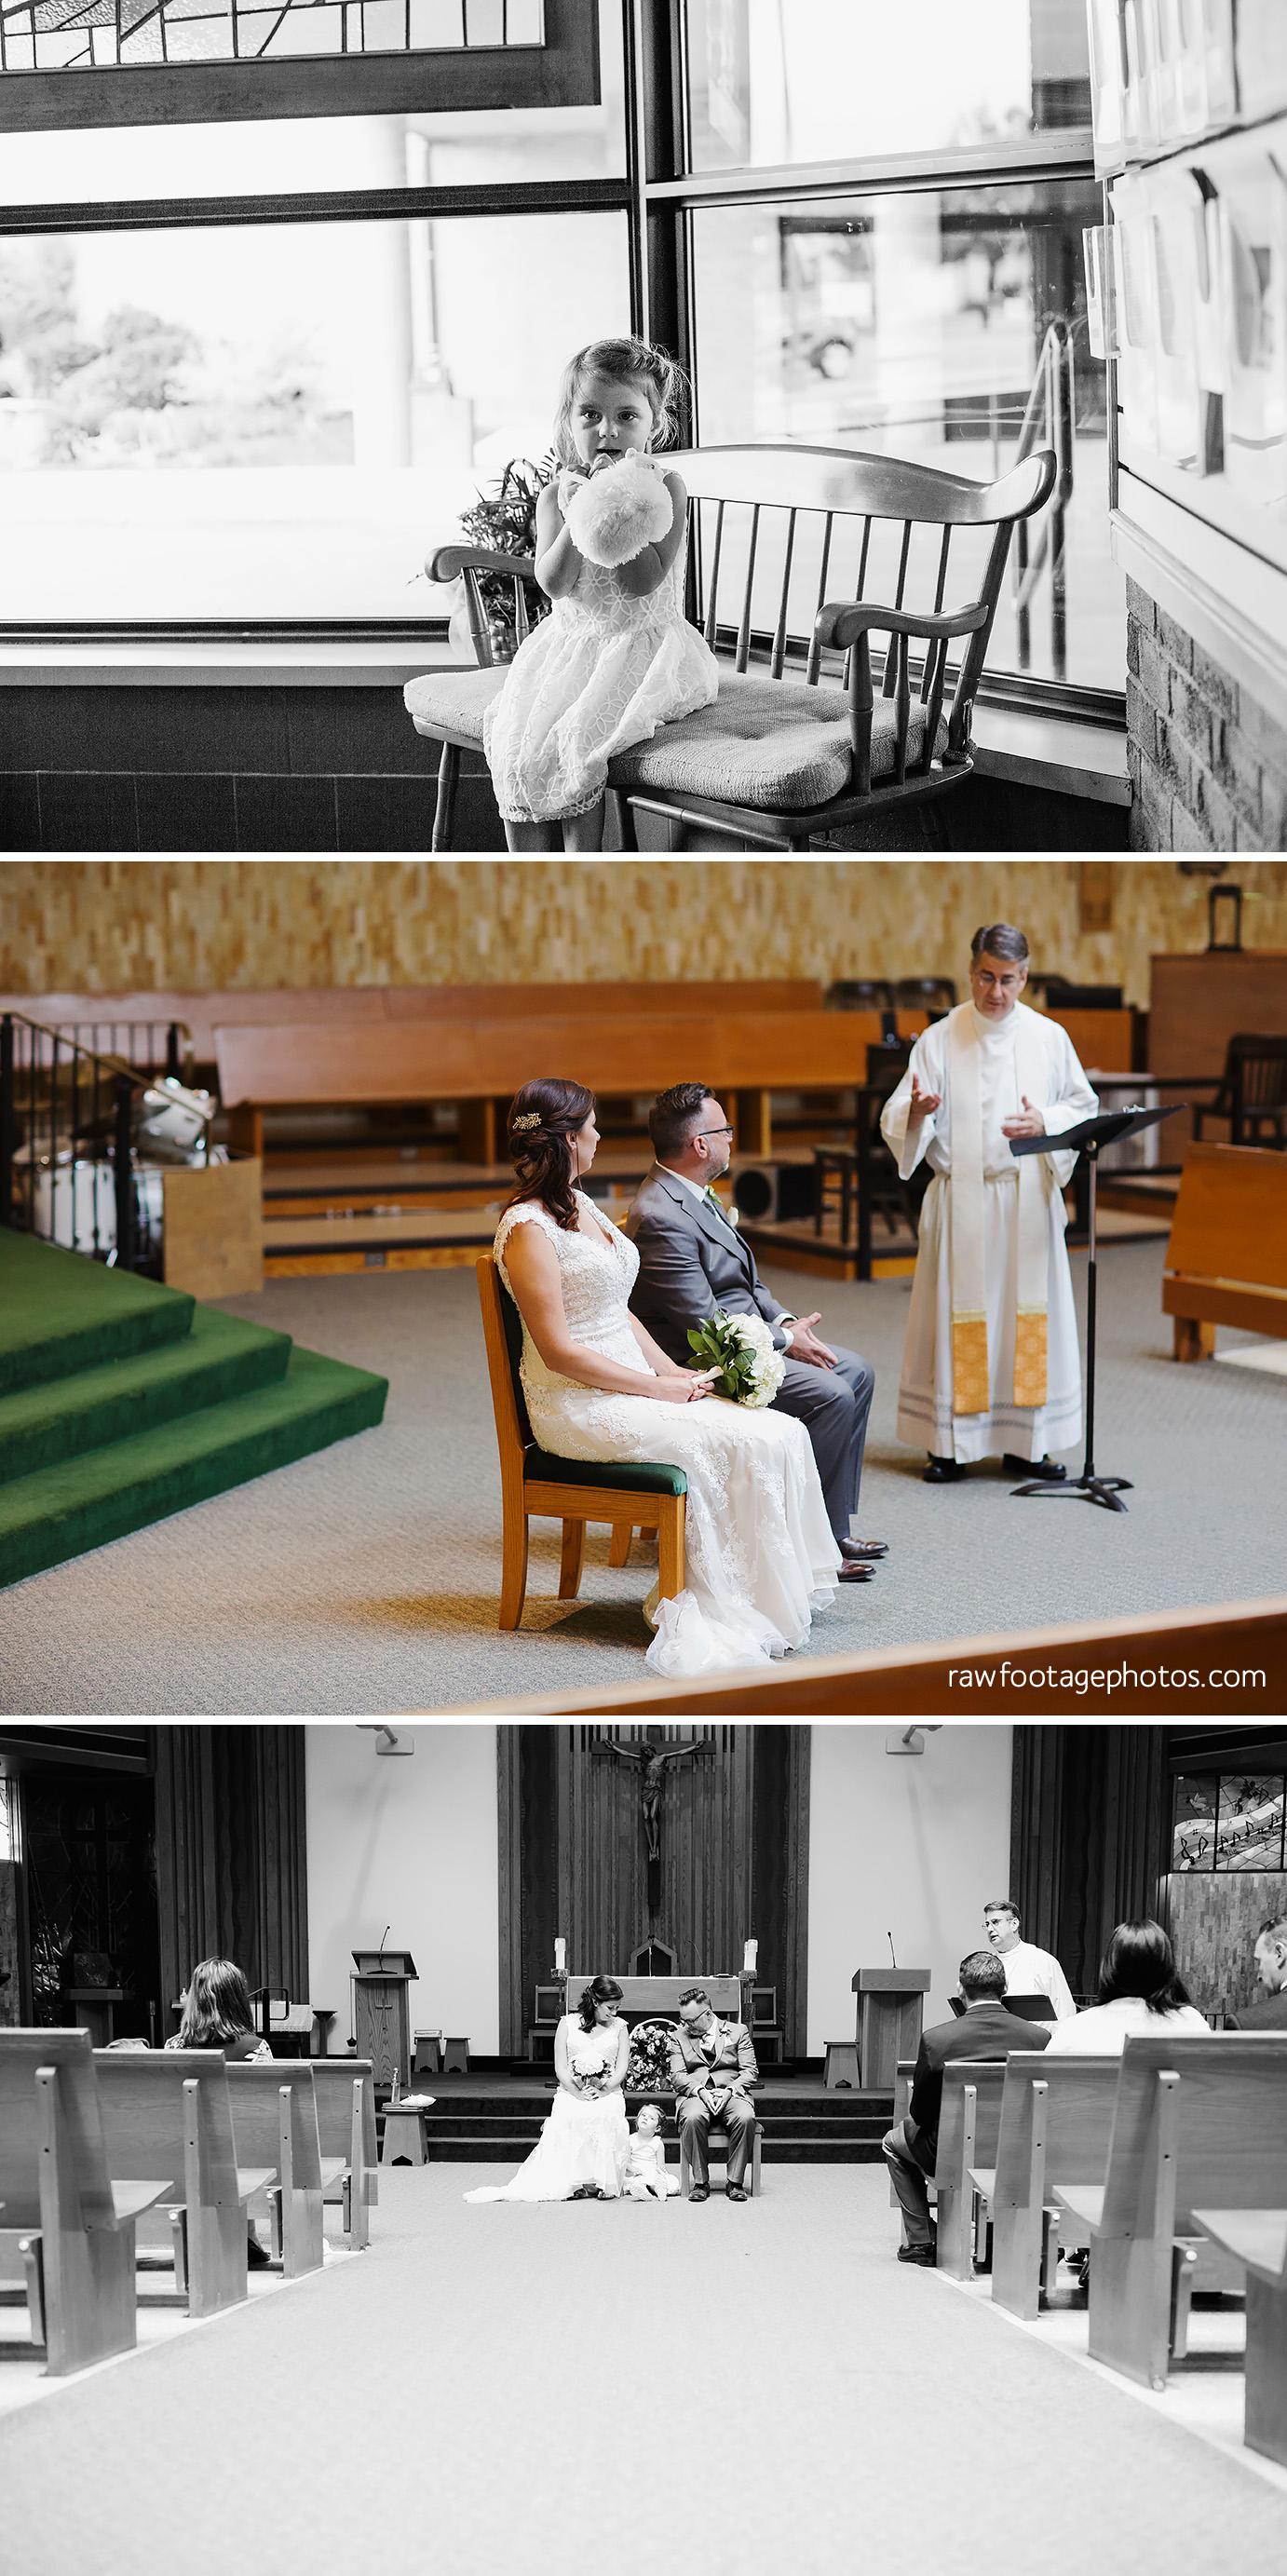 Ceremony at St Justin's Parish